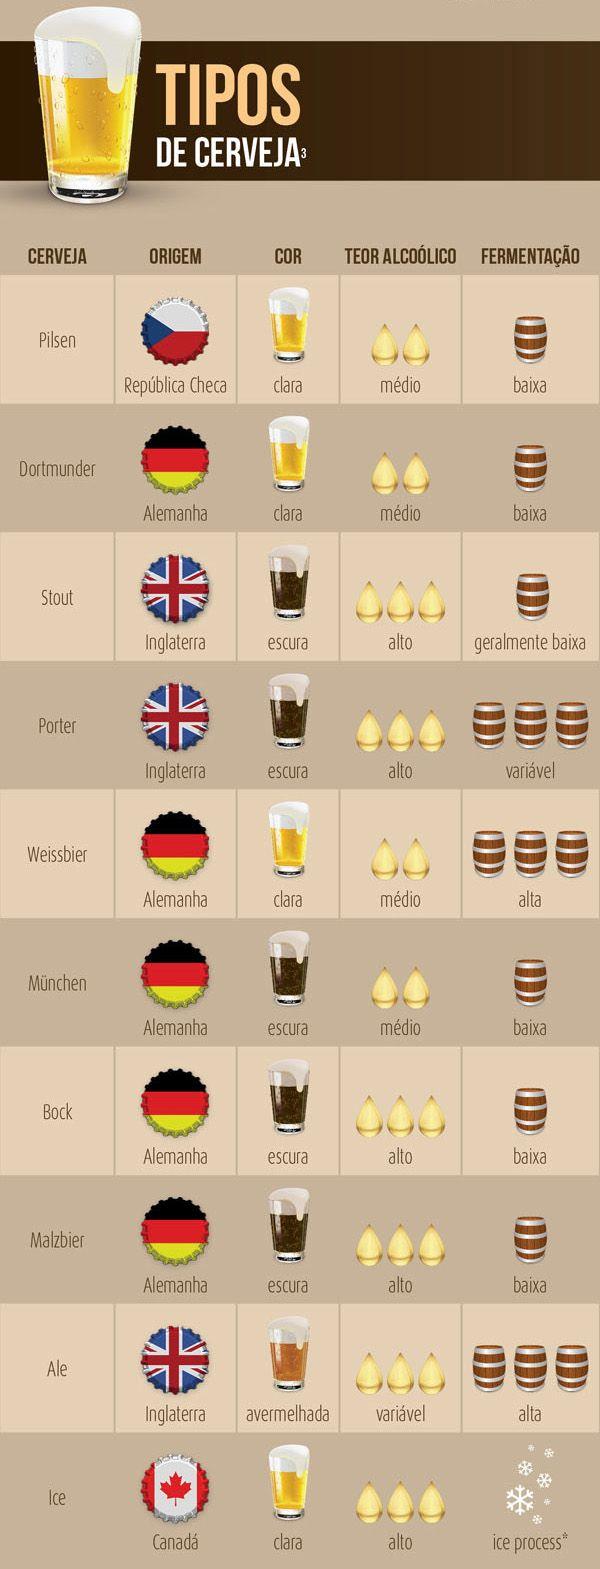 Tipos de Cerveja #infografía